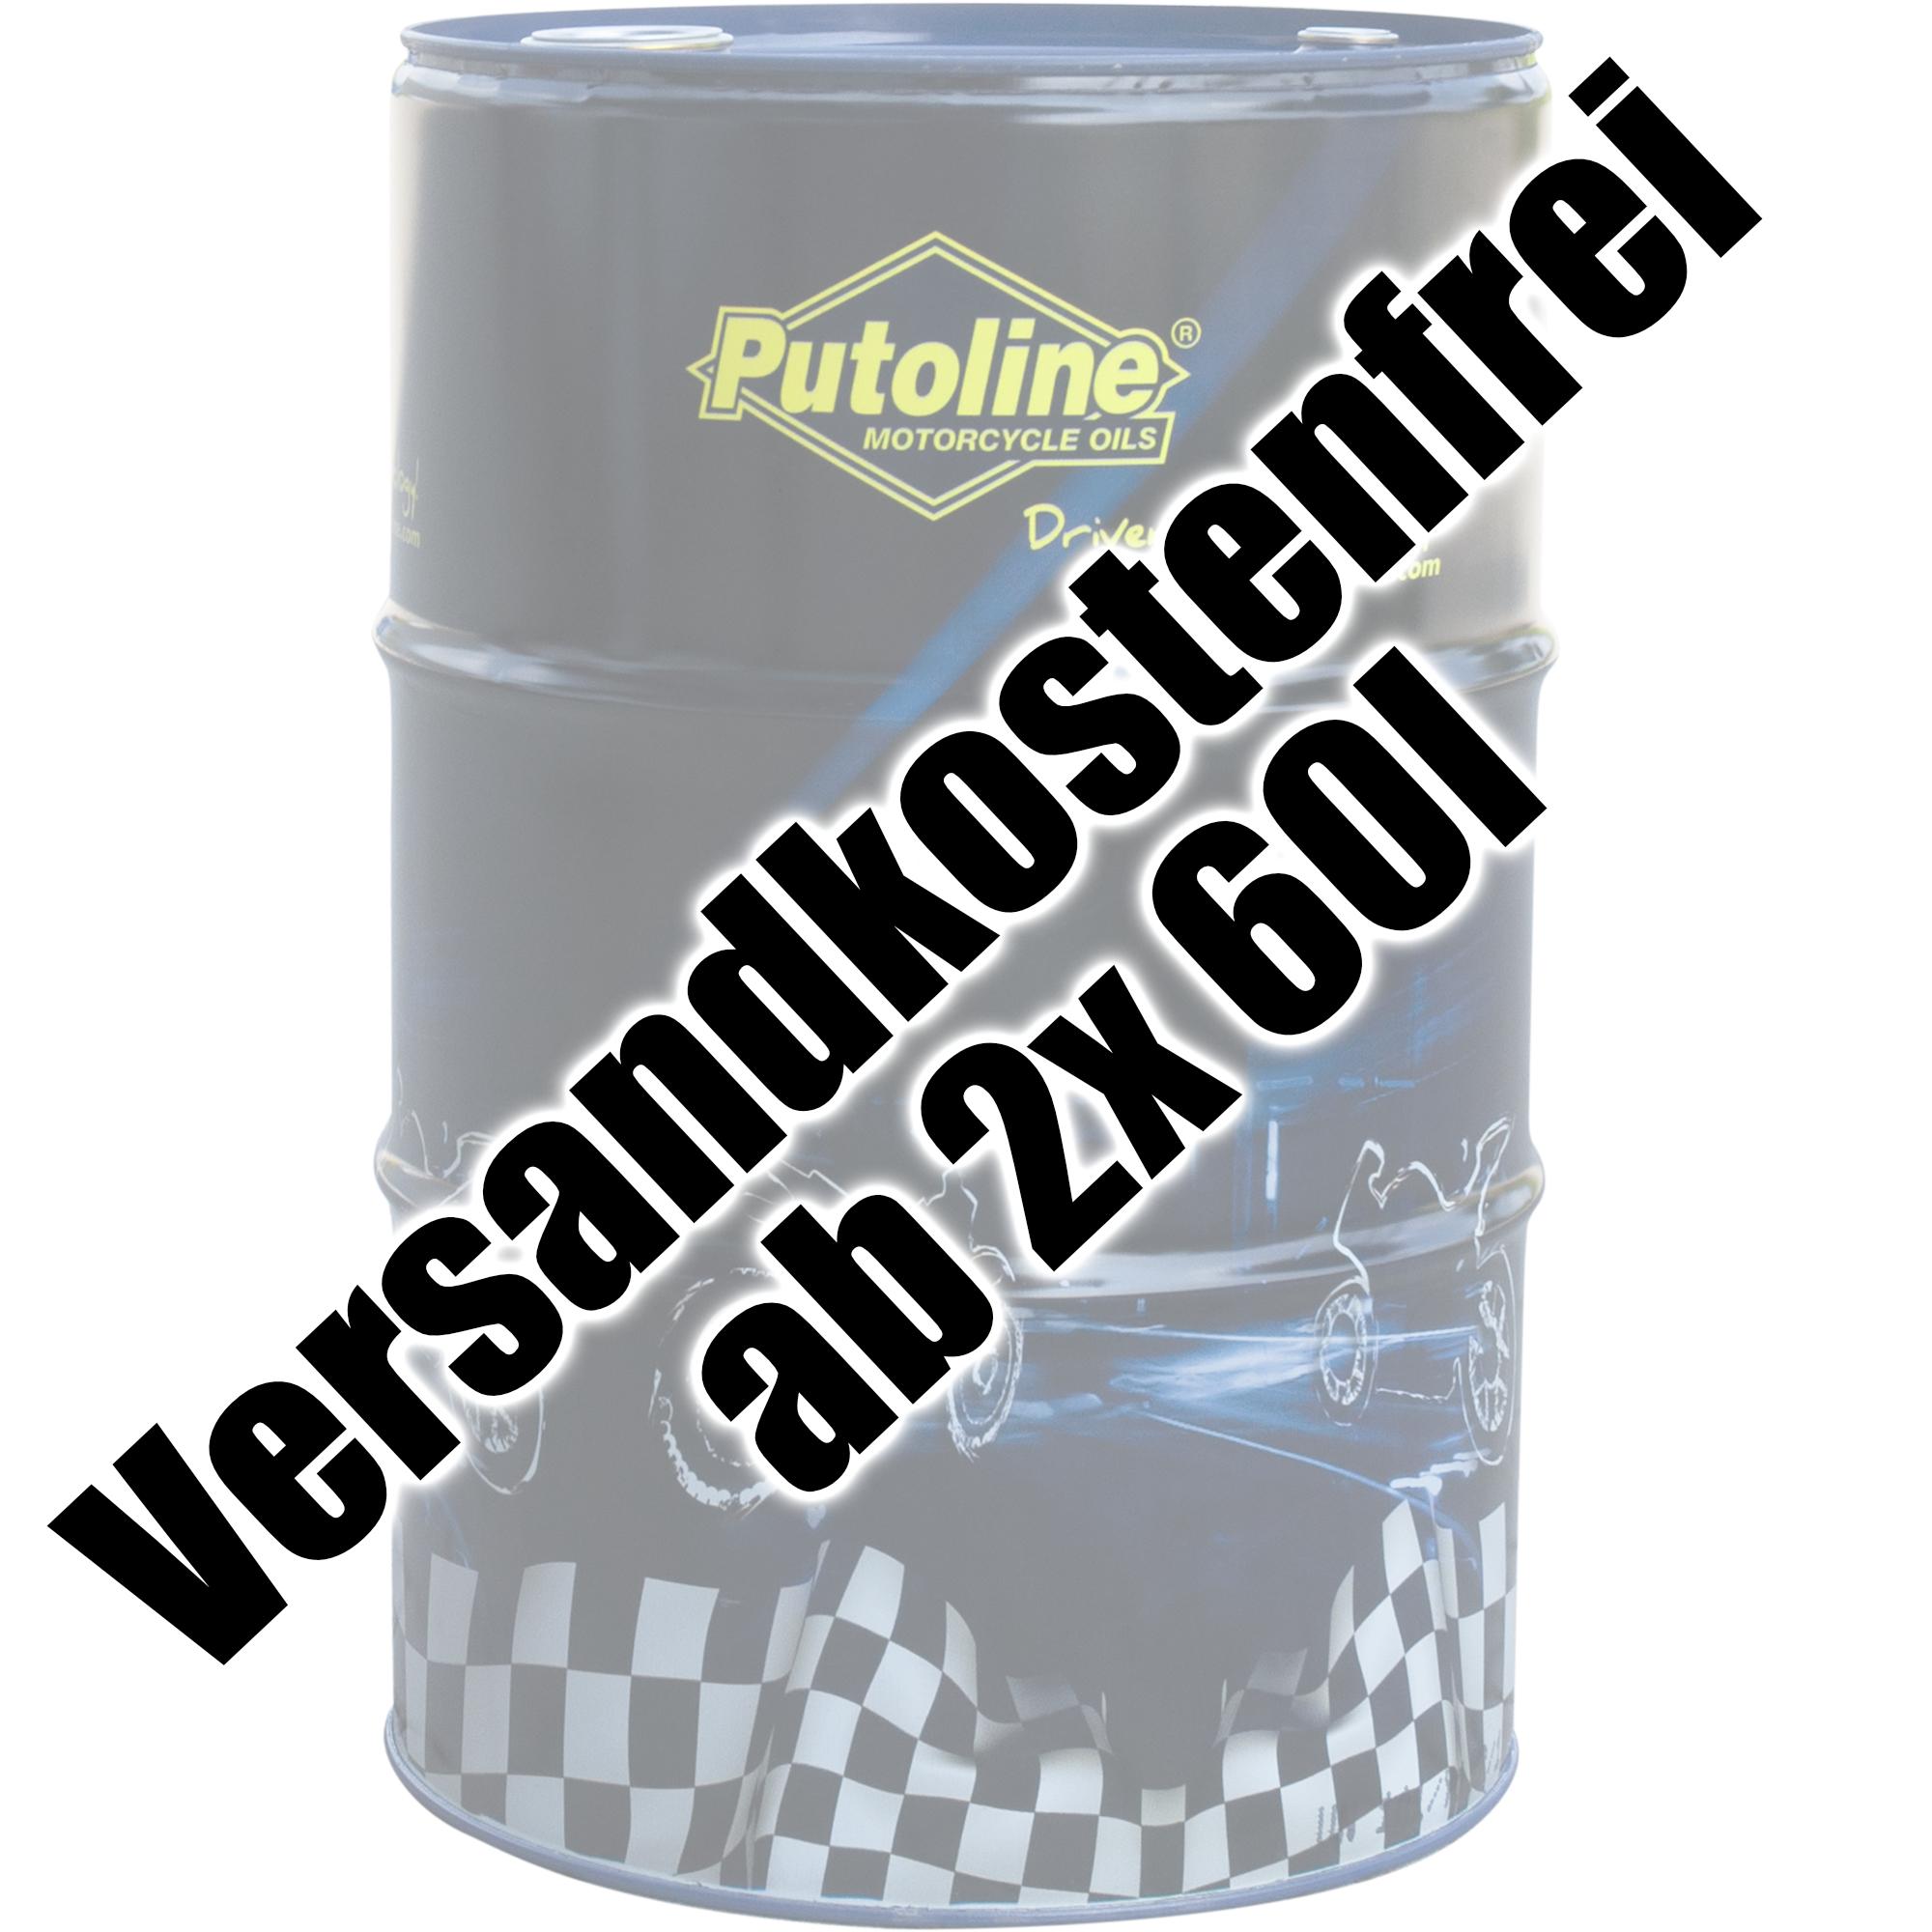 Putoline Stoßdämpfer-Spezialöl GPR6 2.5W 60L